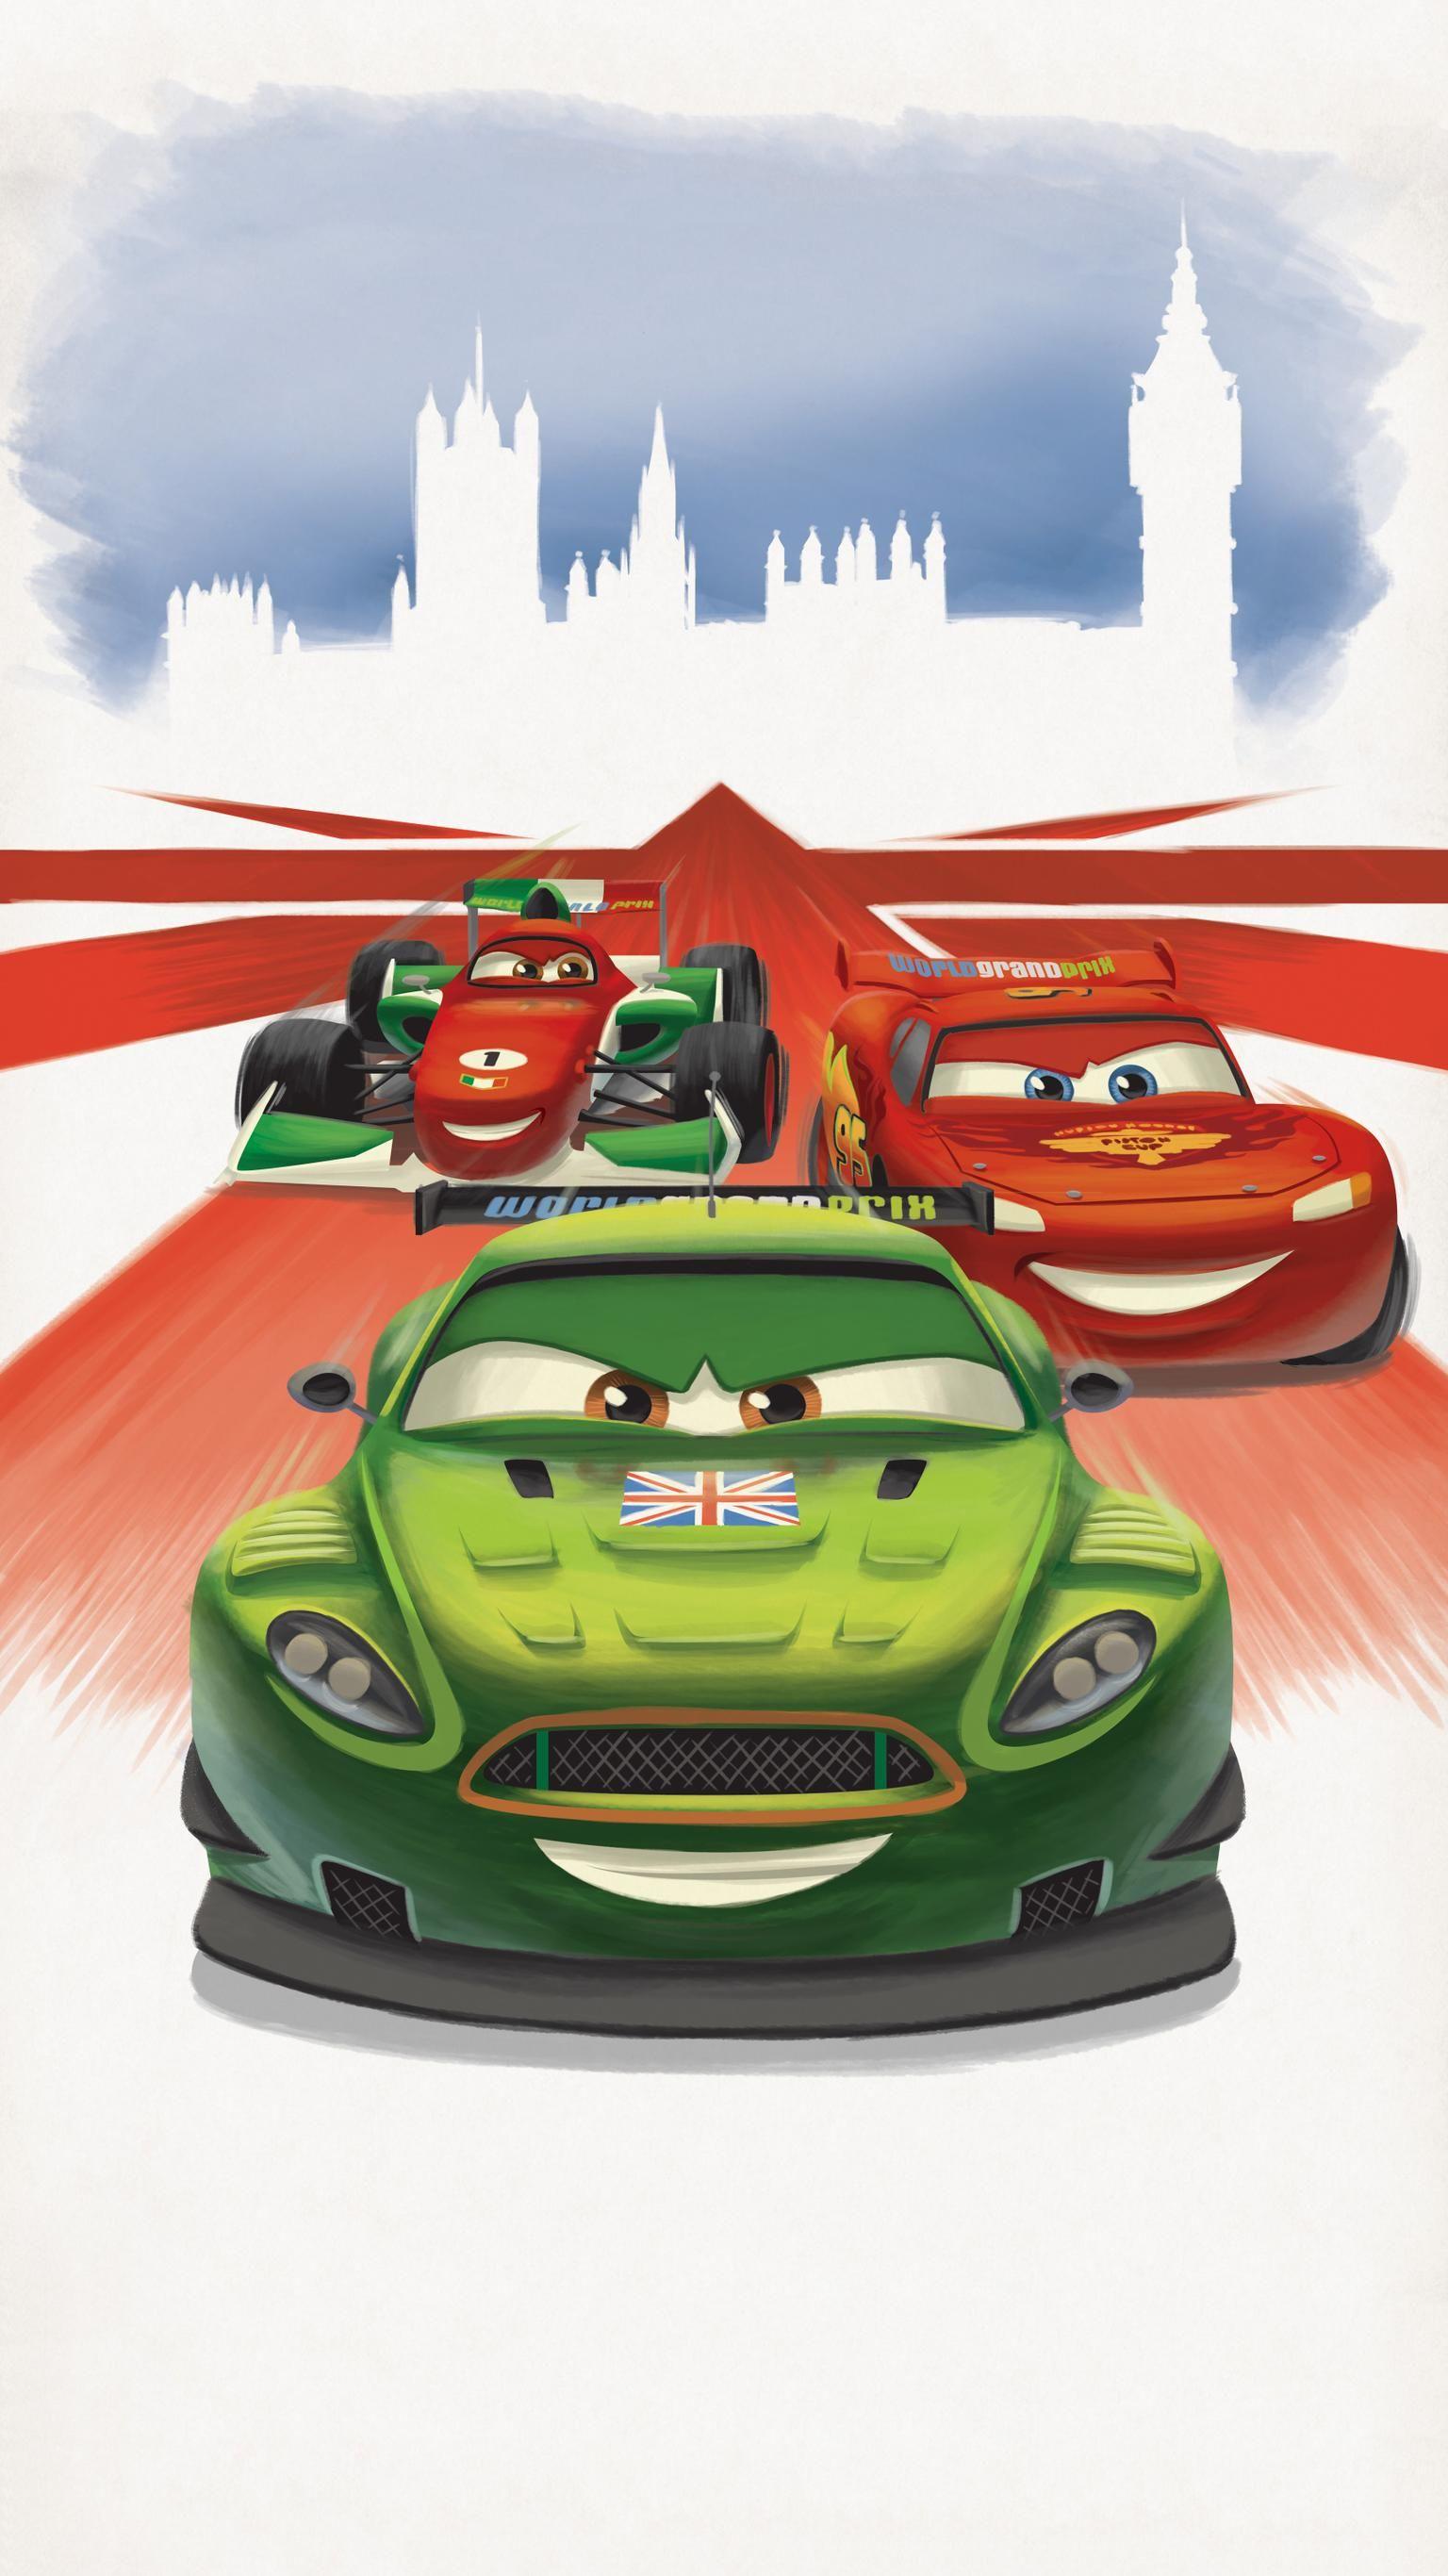 Cars 2 2011 Phone Wallpaper Moviemania Cars Movie Disney Pixar Cars Disney Cars